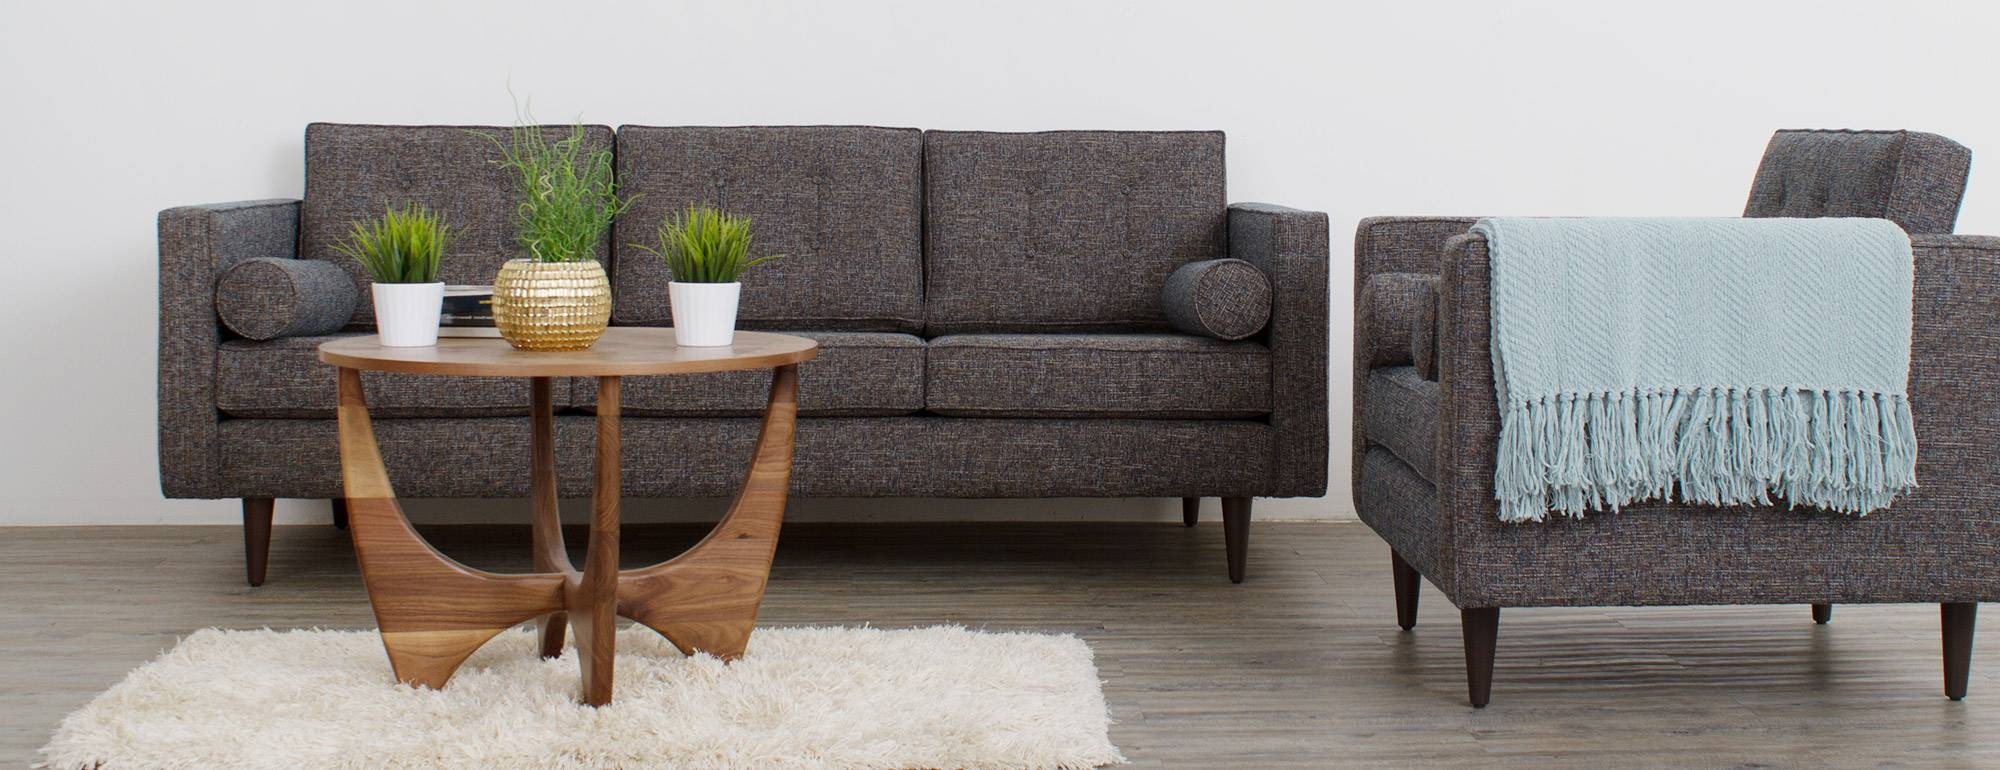 Braxton Sofa | Joybird regarding Braxton Sofas (Image 11 of 15)